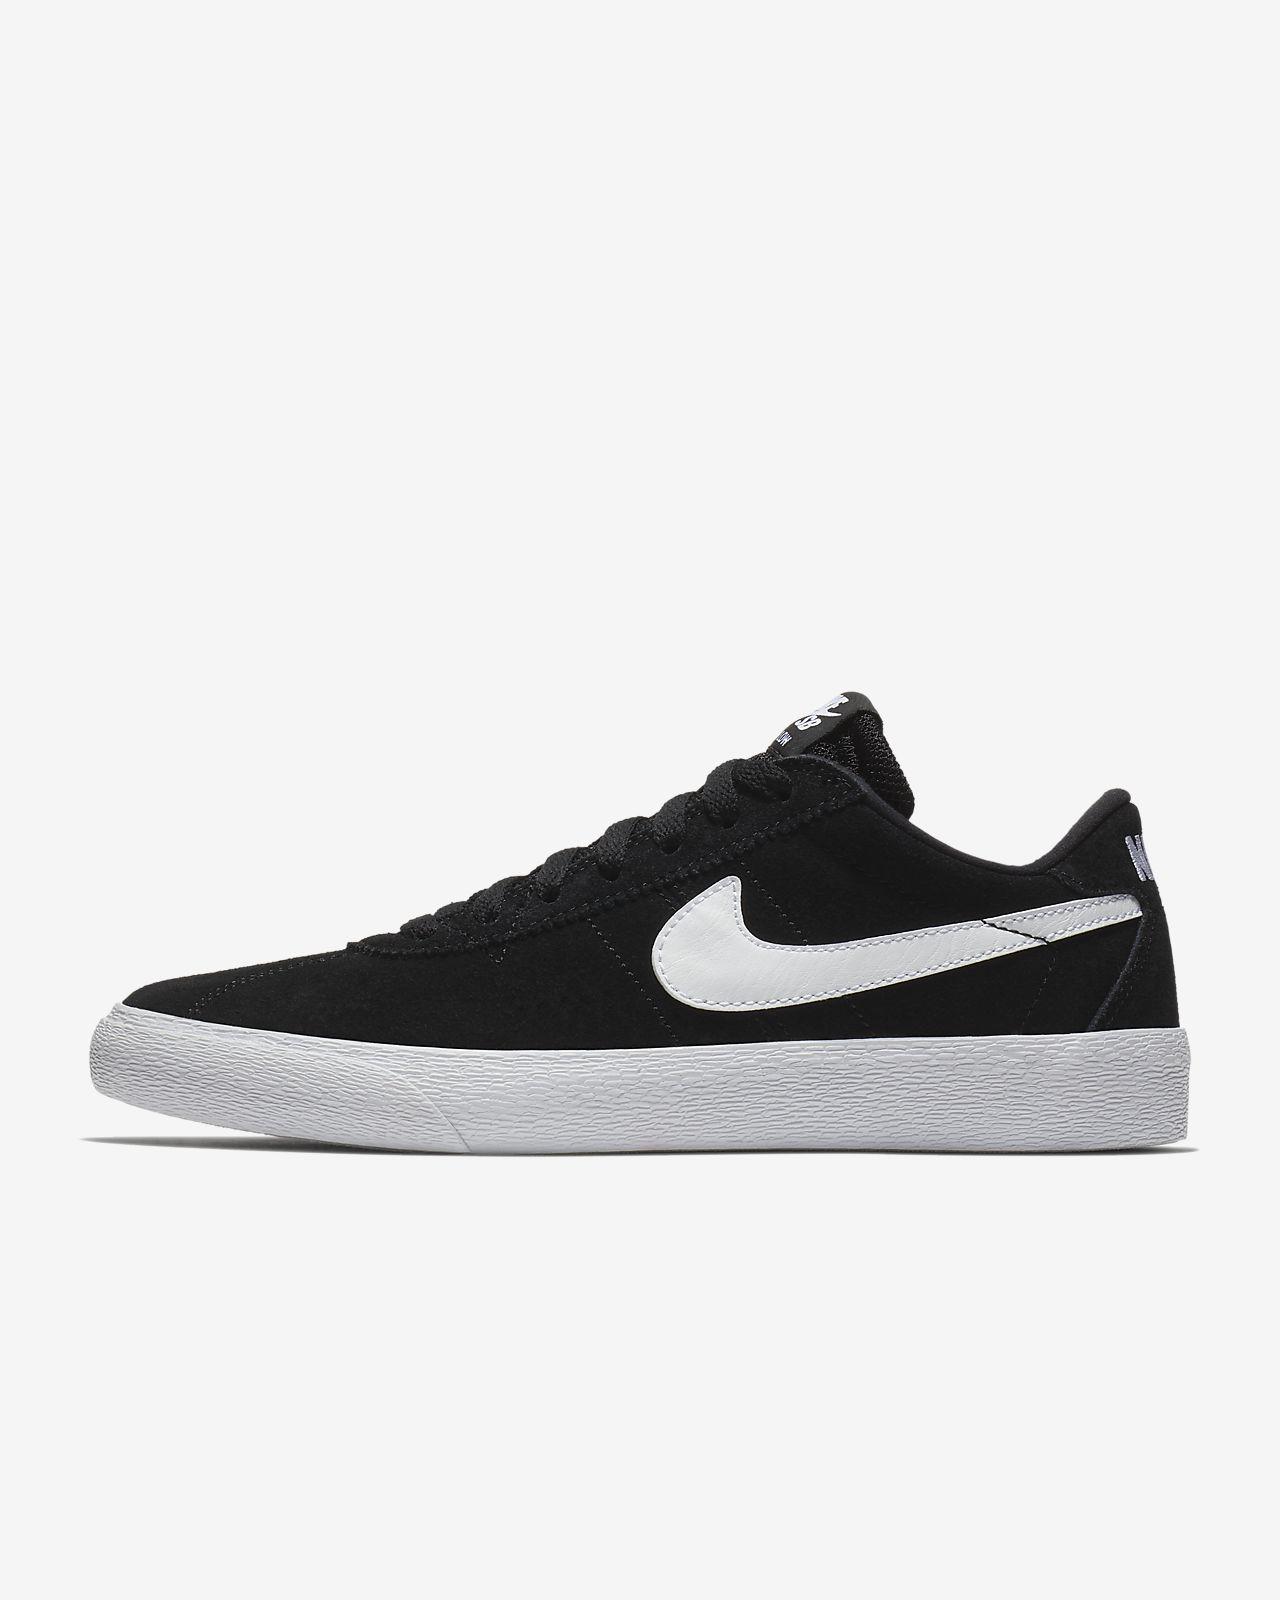 Nike SB Zoom Bruin Low Damen-Skateboardschuh